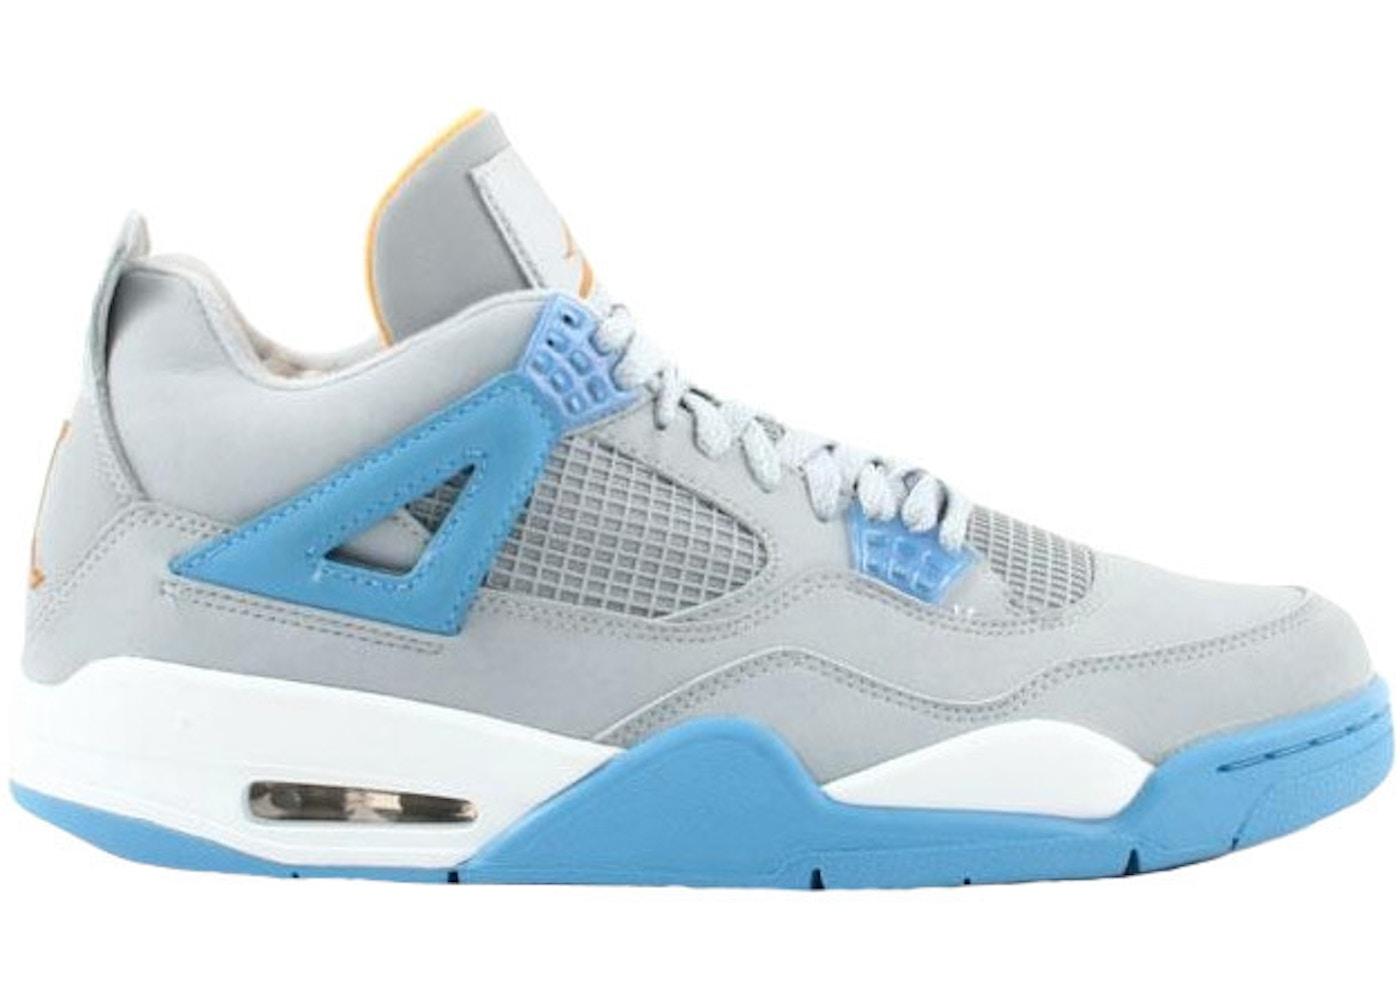 new styles 5ee73 06f14 Jordan 4 Retro Mist Blue